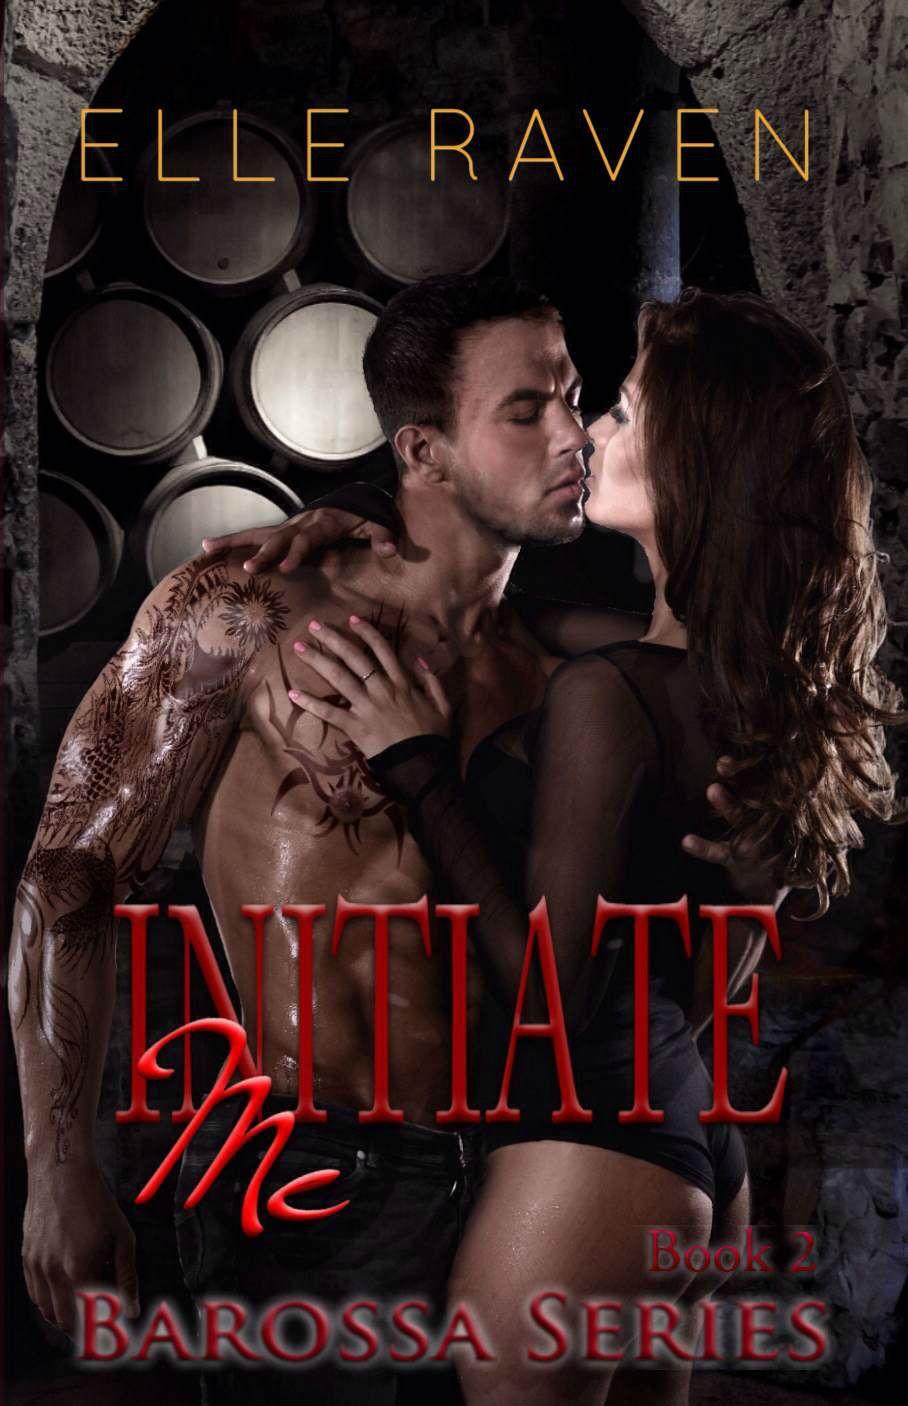 Initiate Me by Elle Raven http://abookaddictsdelight.tumblr.com/post/104036796591/initiate-me-elle-raven-cover-reveal